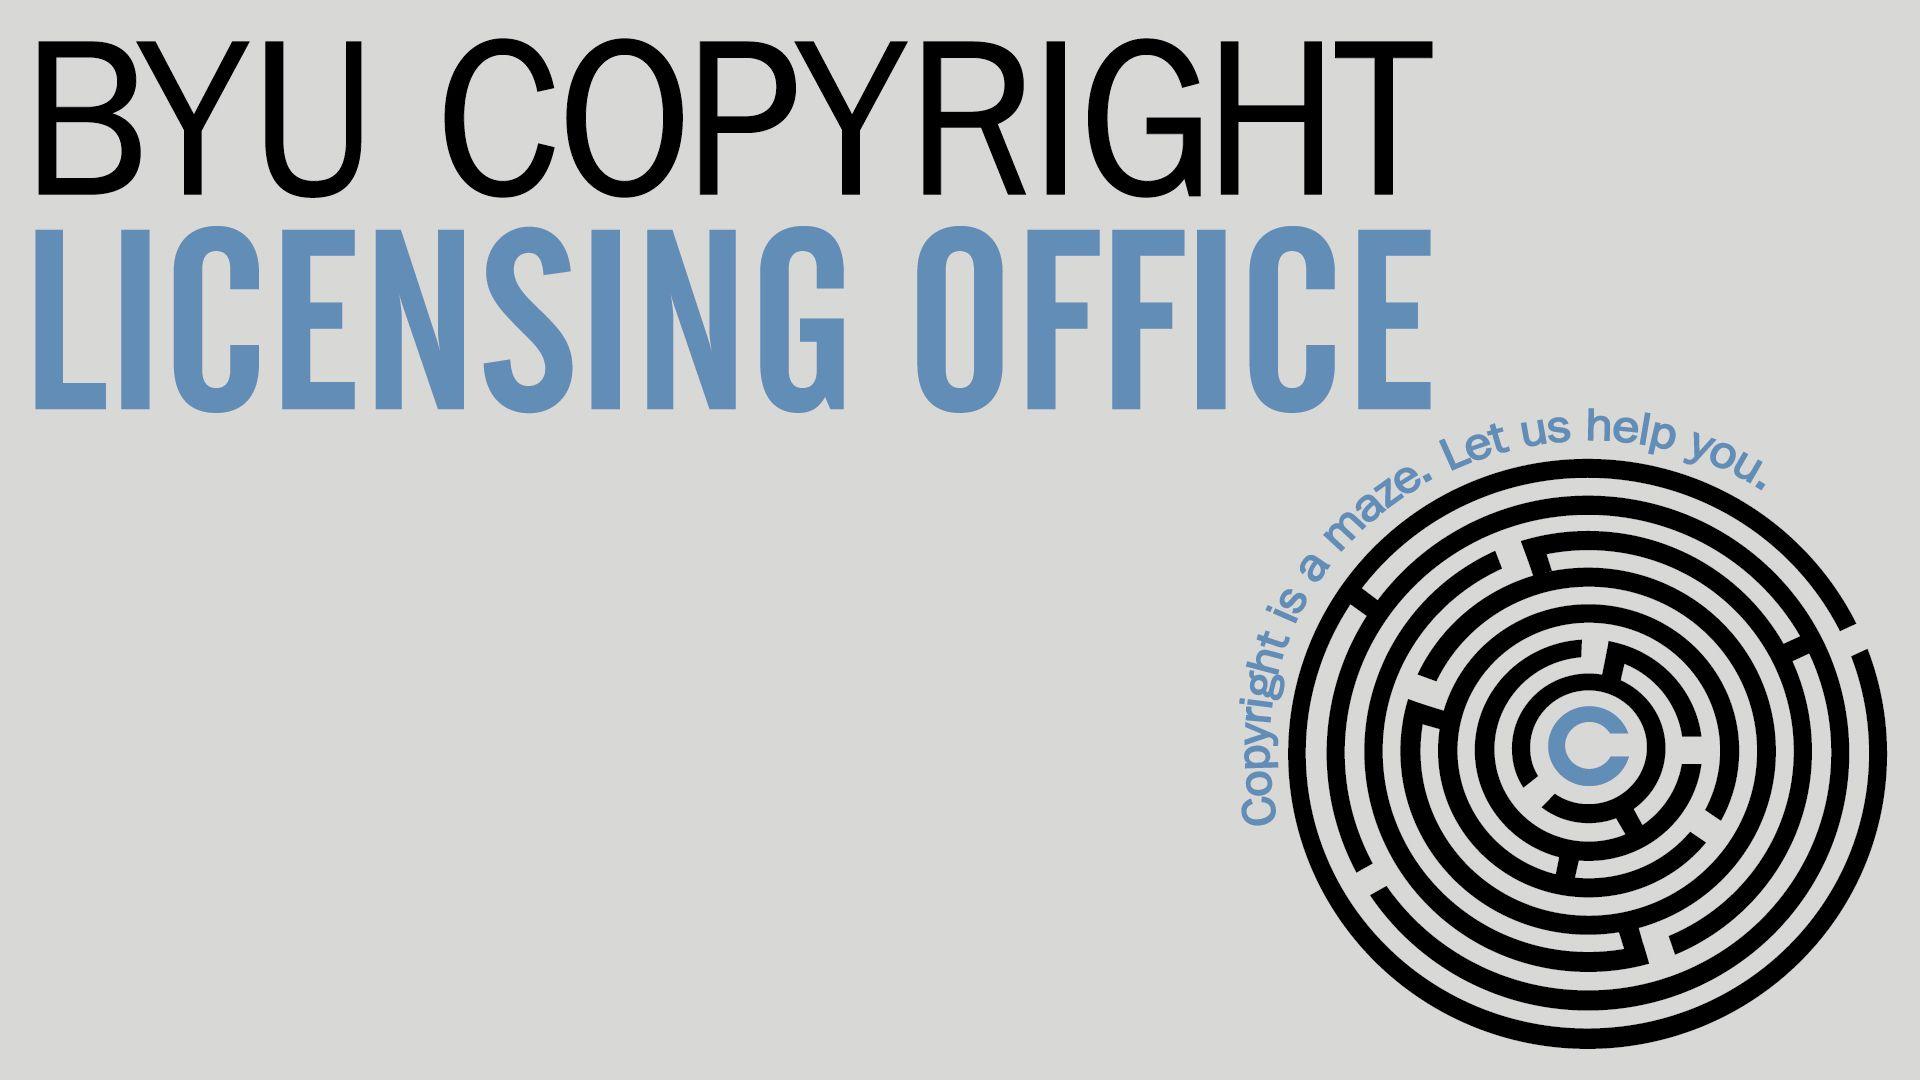 Copyright Licensing Office Tech company logos, Company